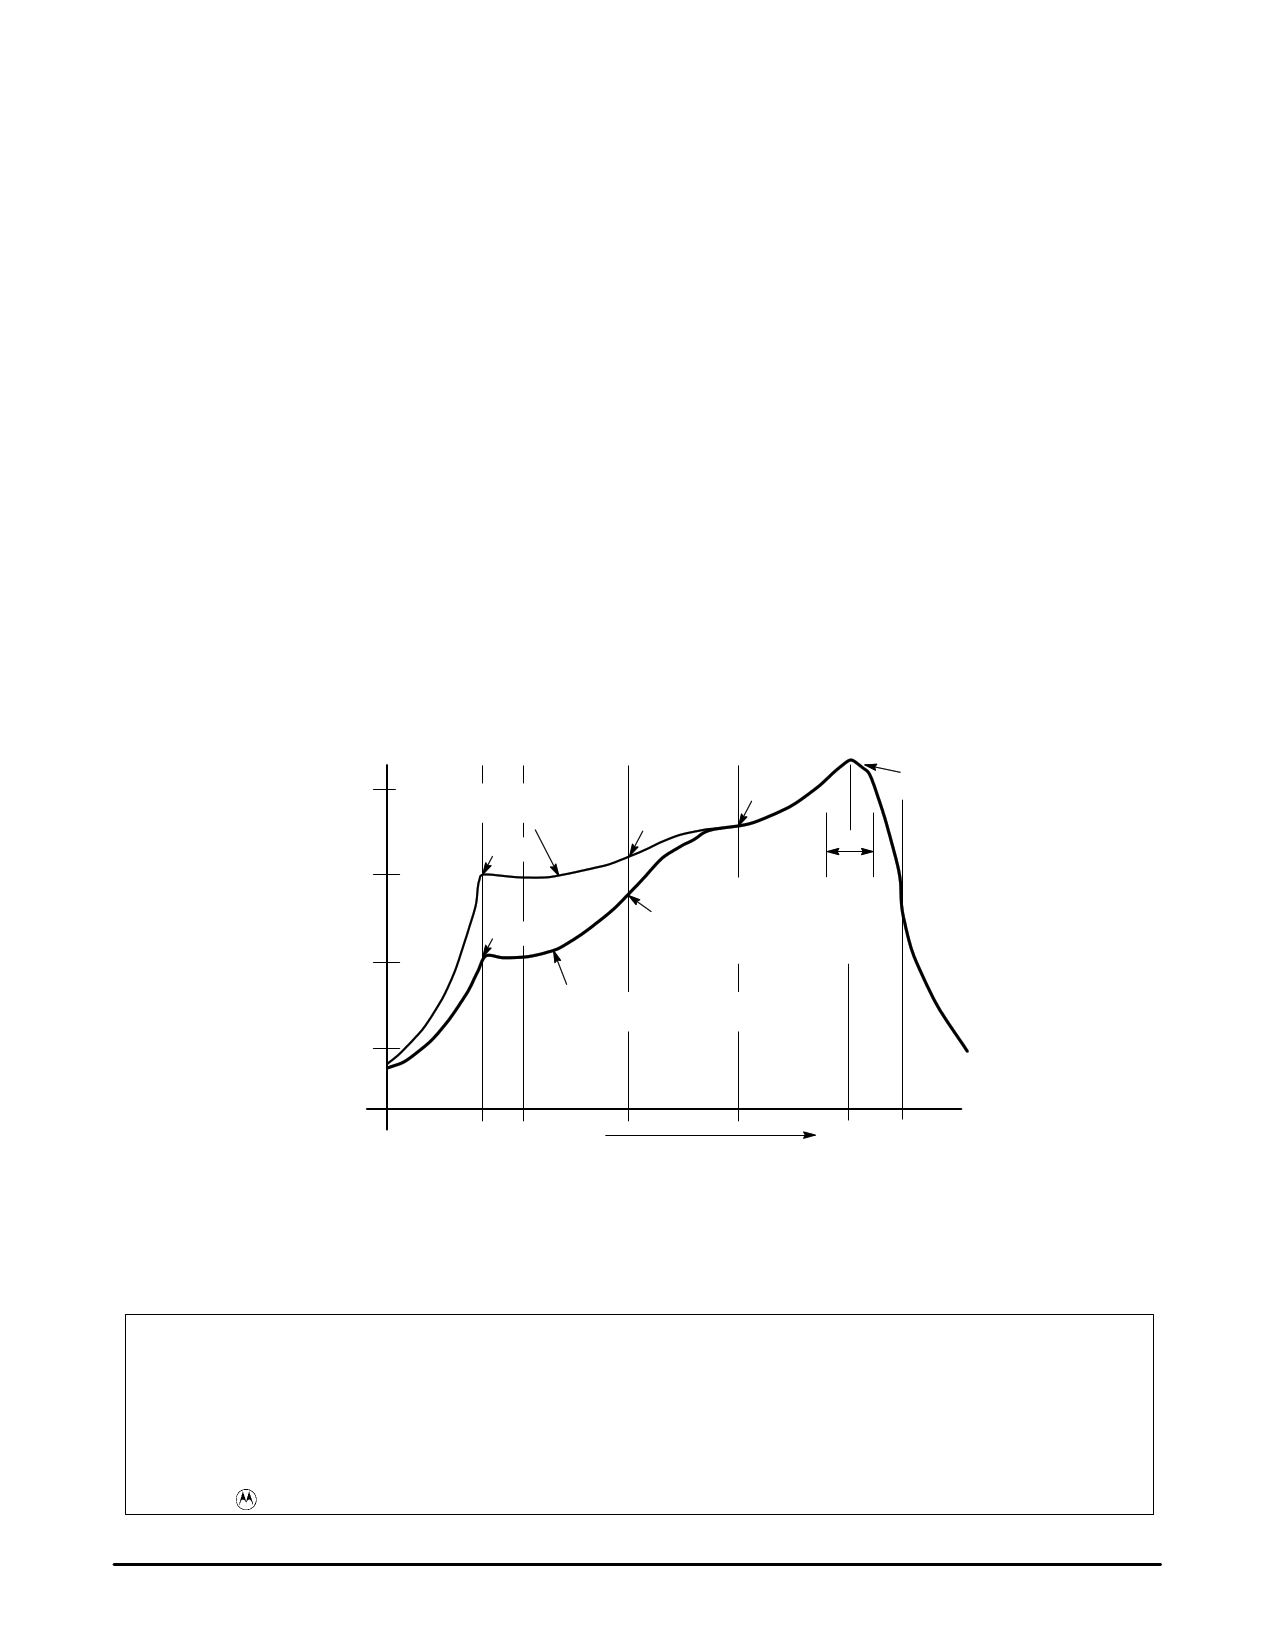 MMBT1010LT1 pdf, ピン配列